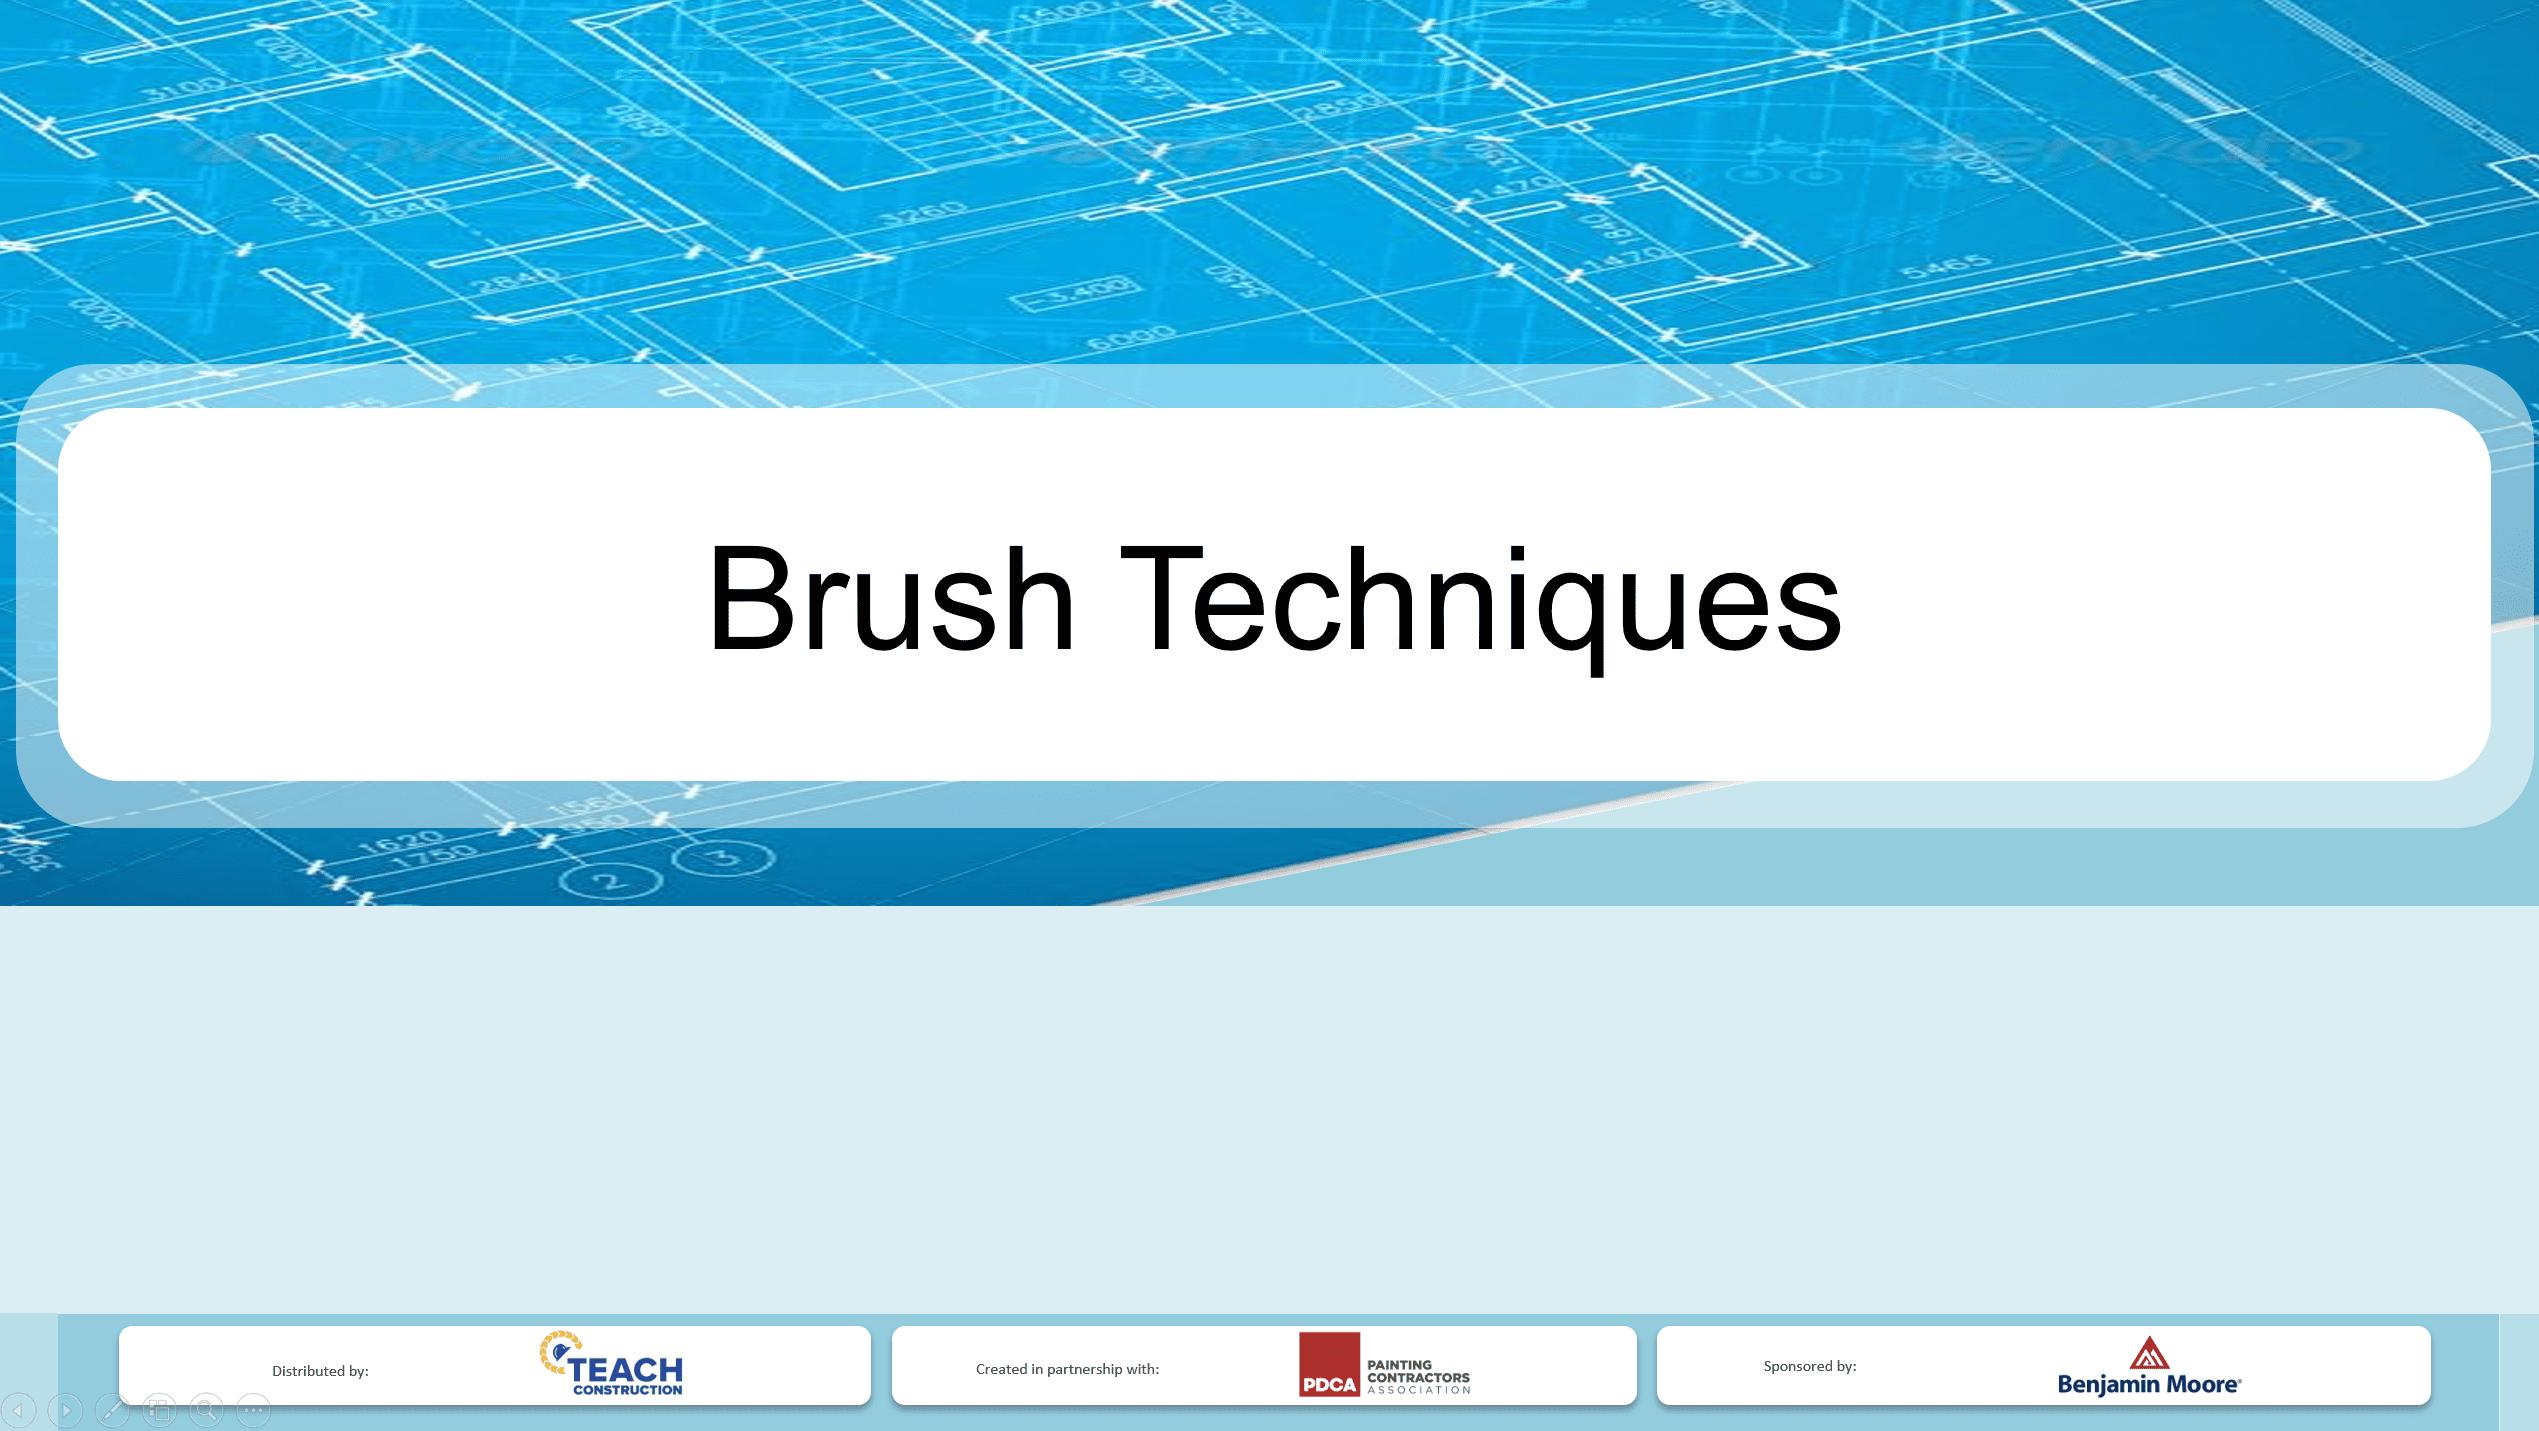 Brush Techniques - Presentation Image